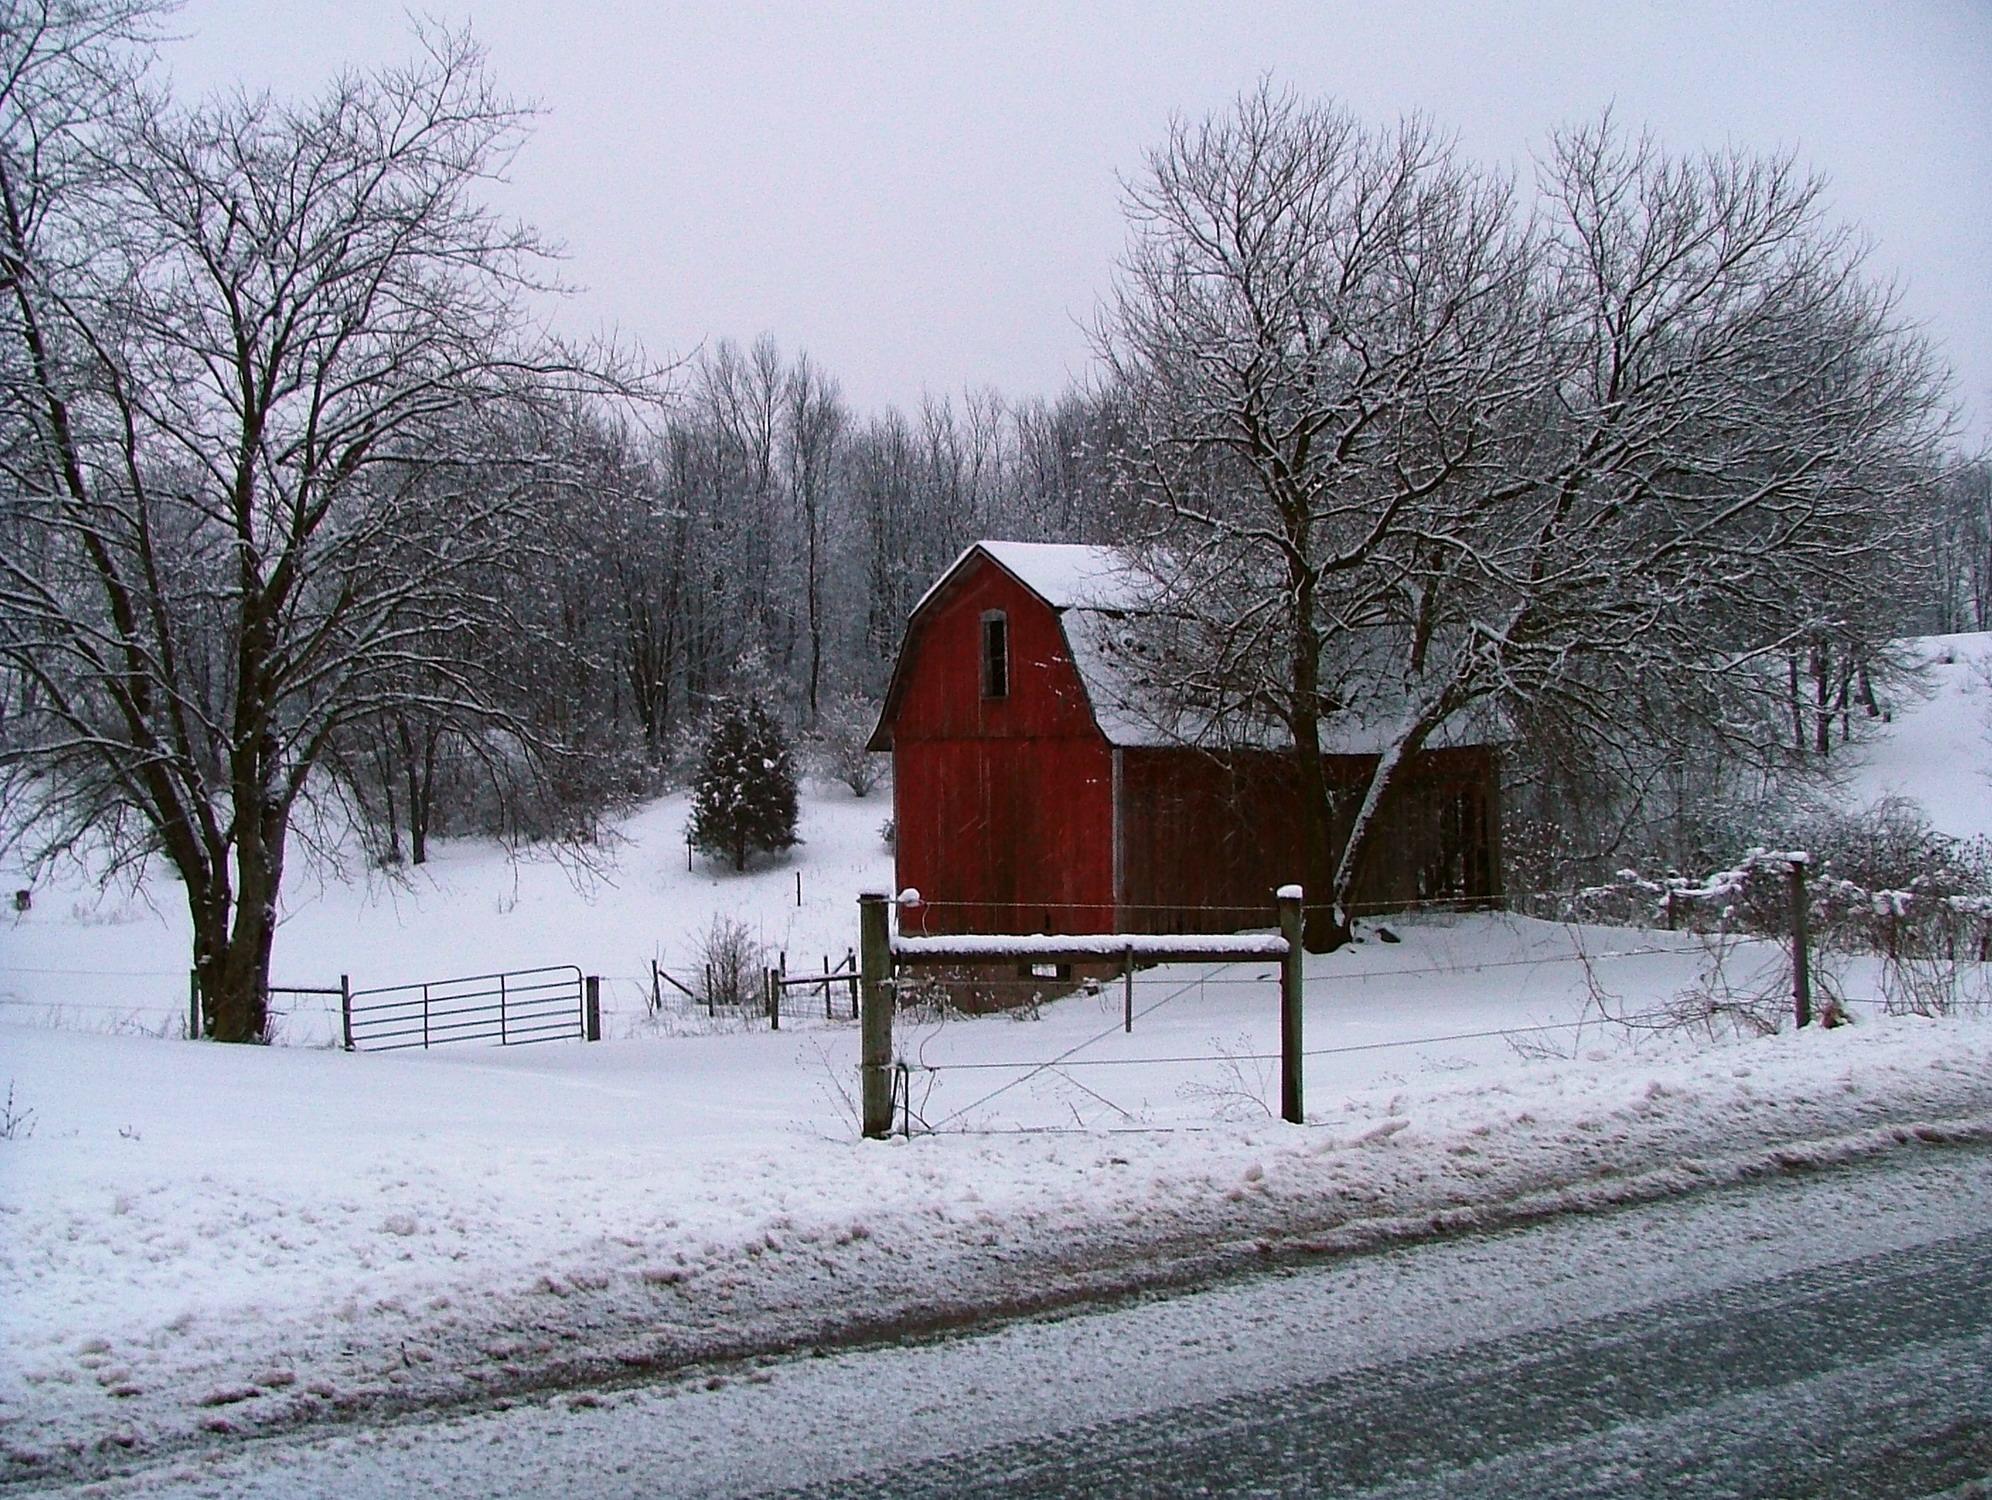 Winter Barn Landscape By Deviantgirl77 On Deviantart